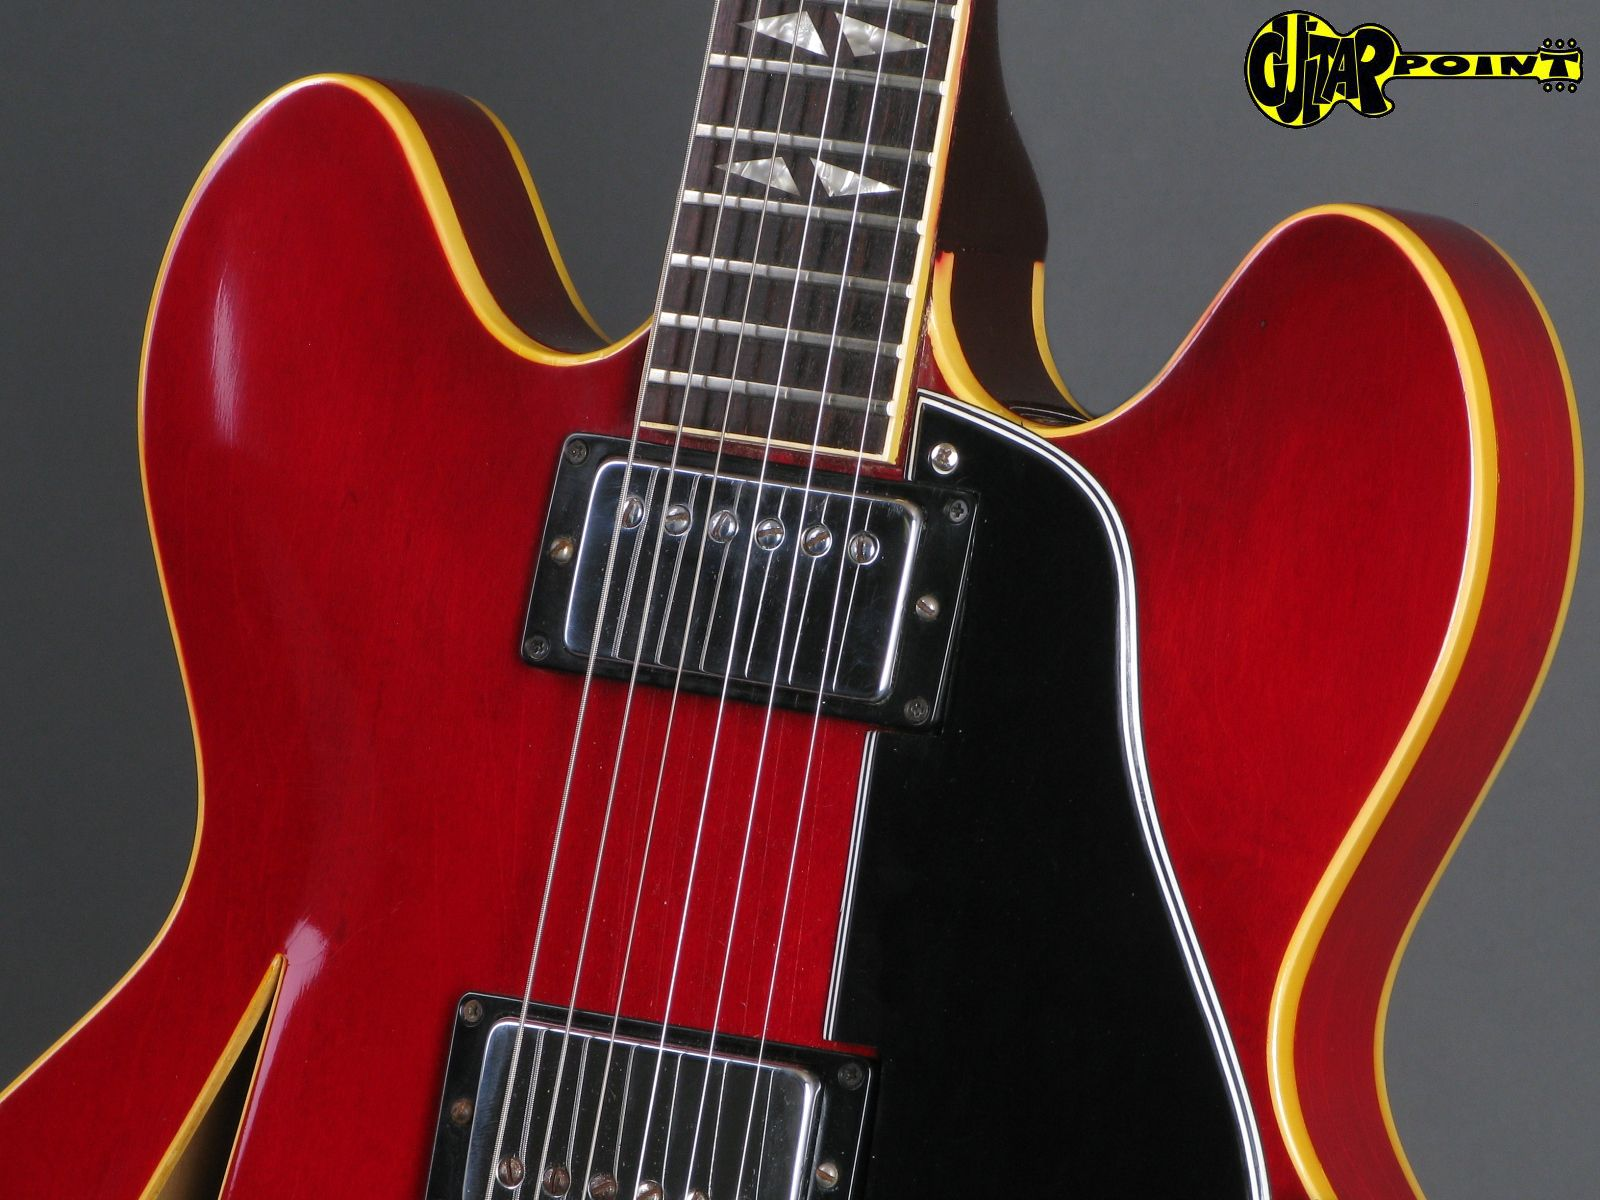 Gibson Trini Lopez 1966 Cherry Guitar For Sale GuitarPoint